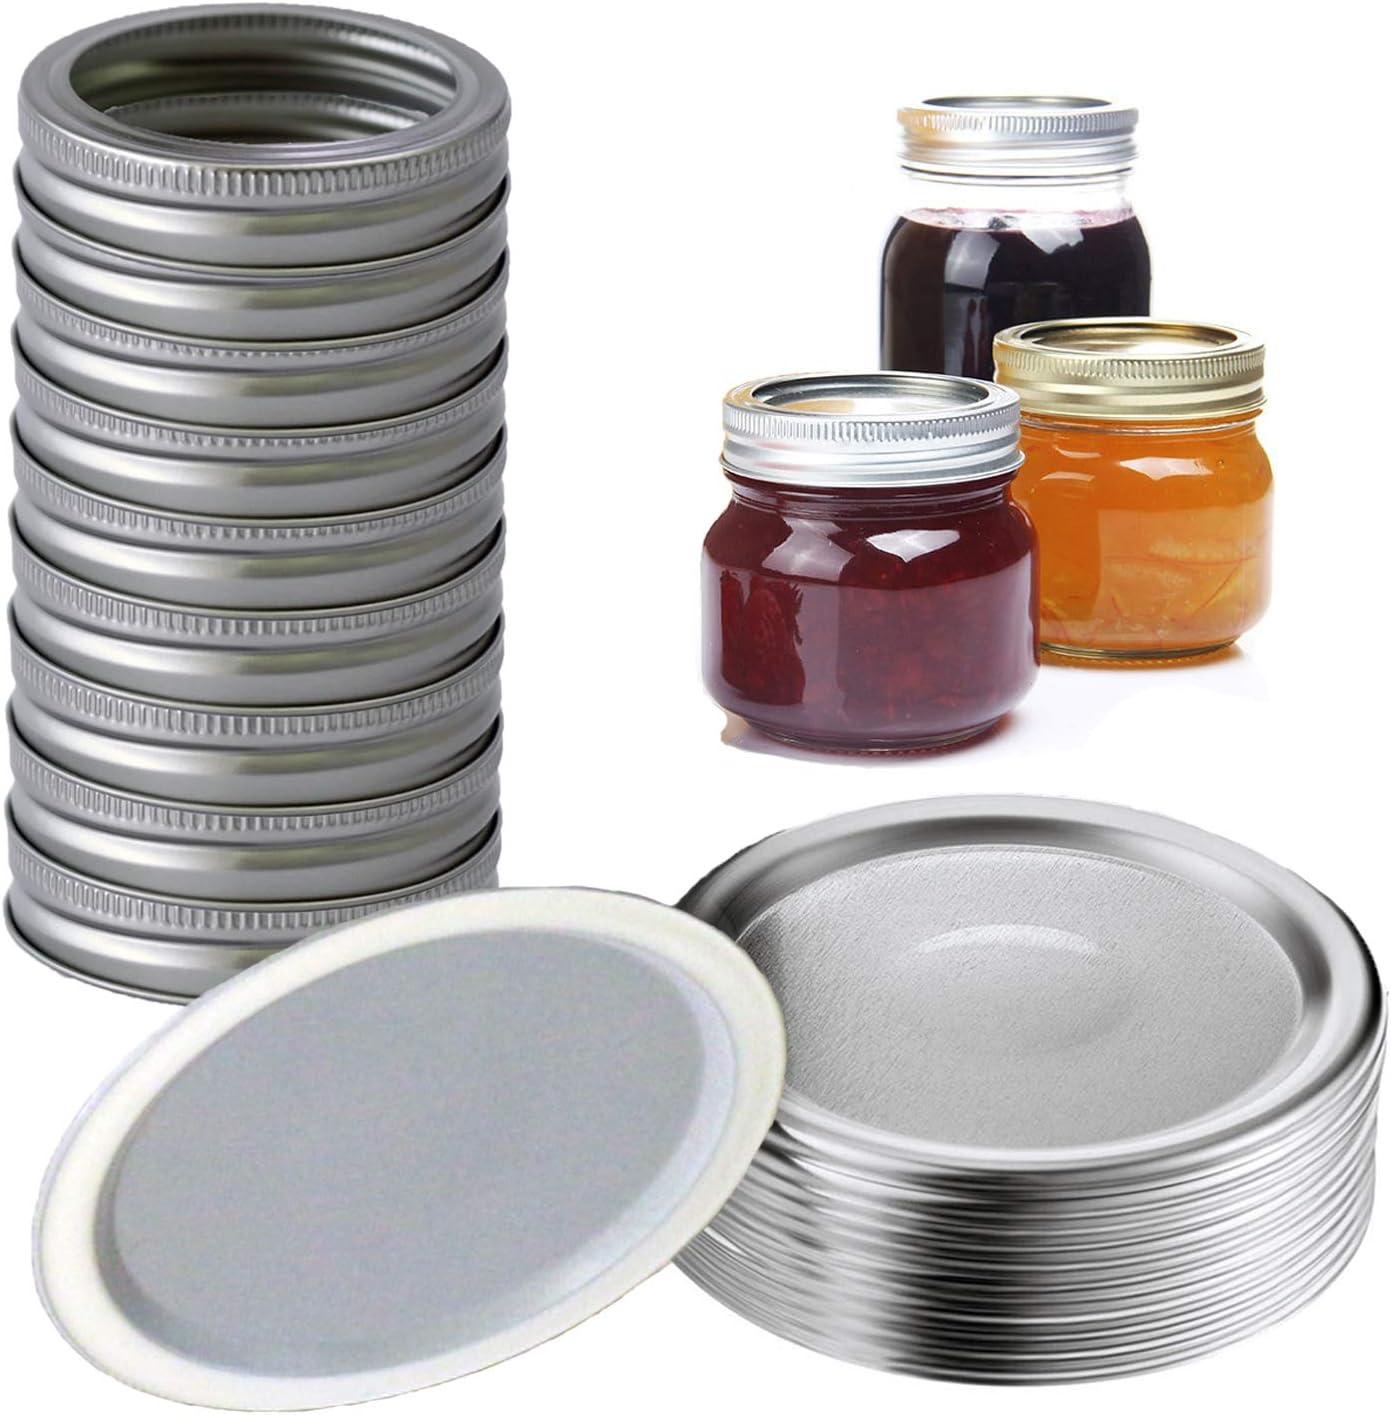 48 Pcs Stainless Steel Canning Lids Regular Mouth Mason Jar Lids and Bands, Lids for Mason Jar Regular Mouth, Split-Type Lids Leak Proof Secure Mason Storage Caps (24pcs Lids & 24pcs Bands)